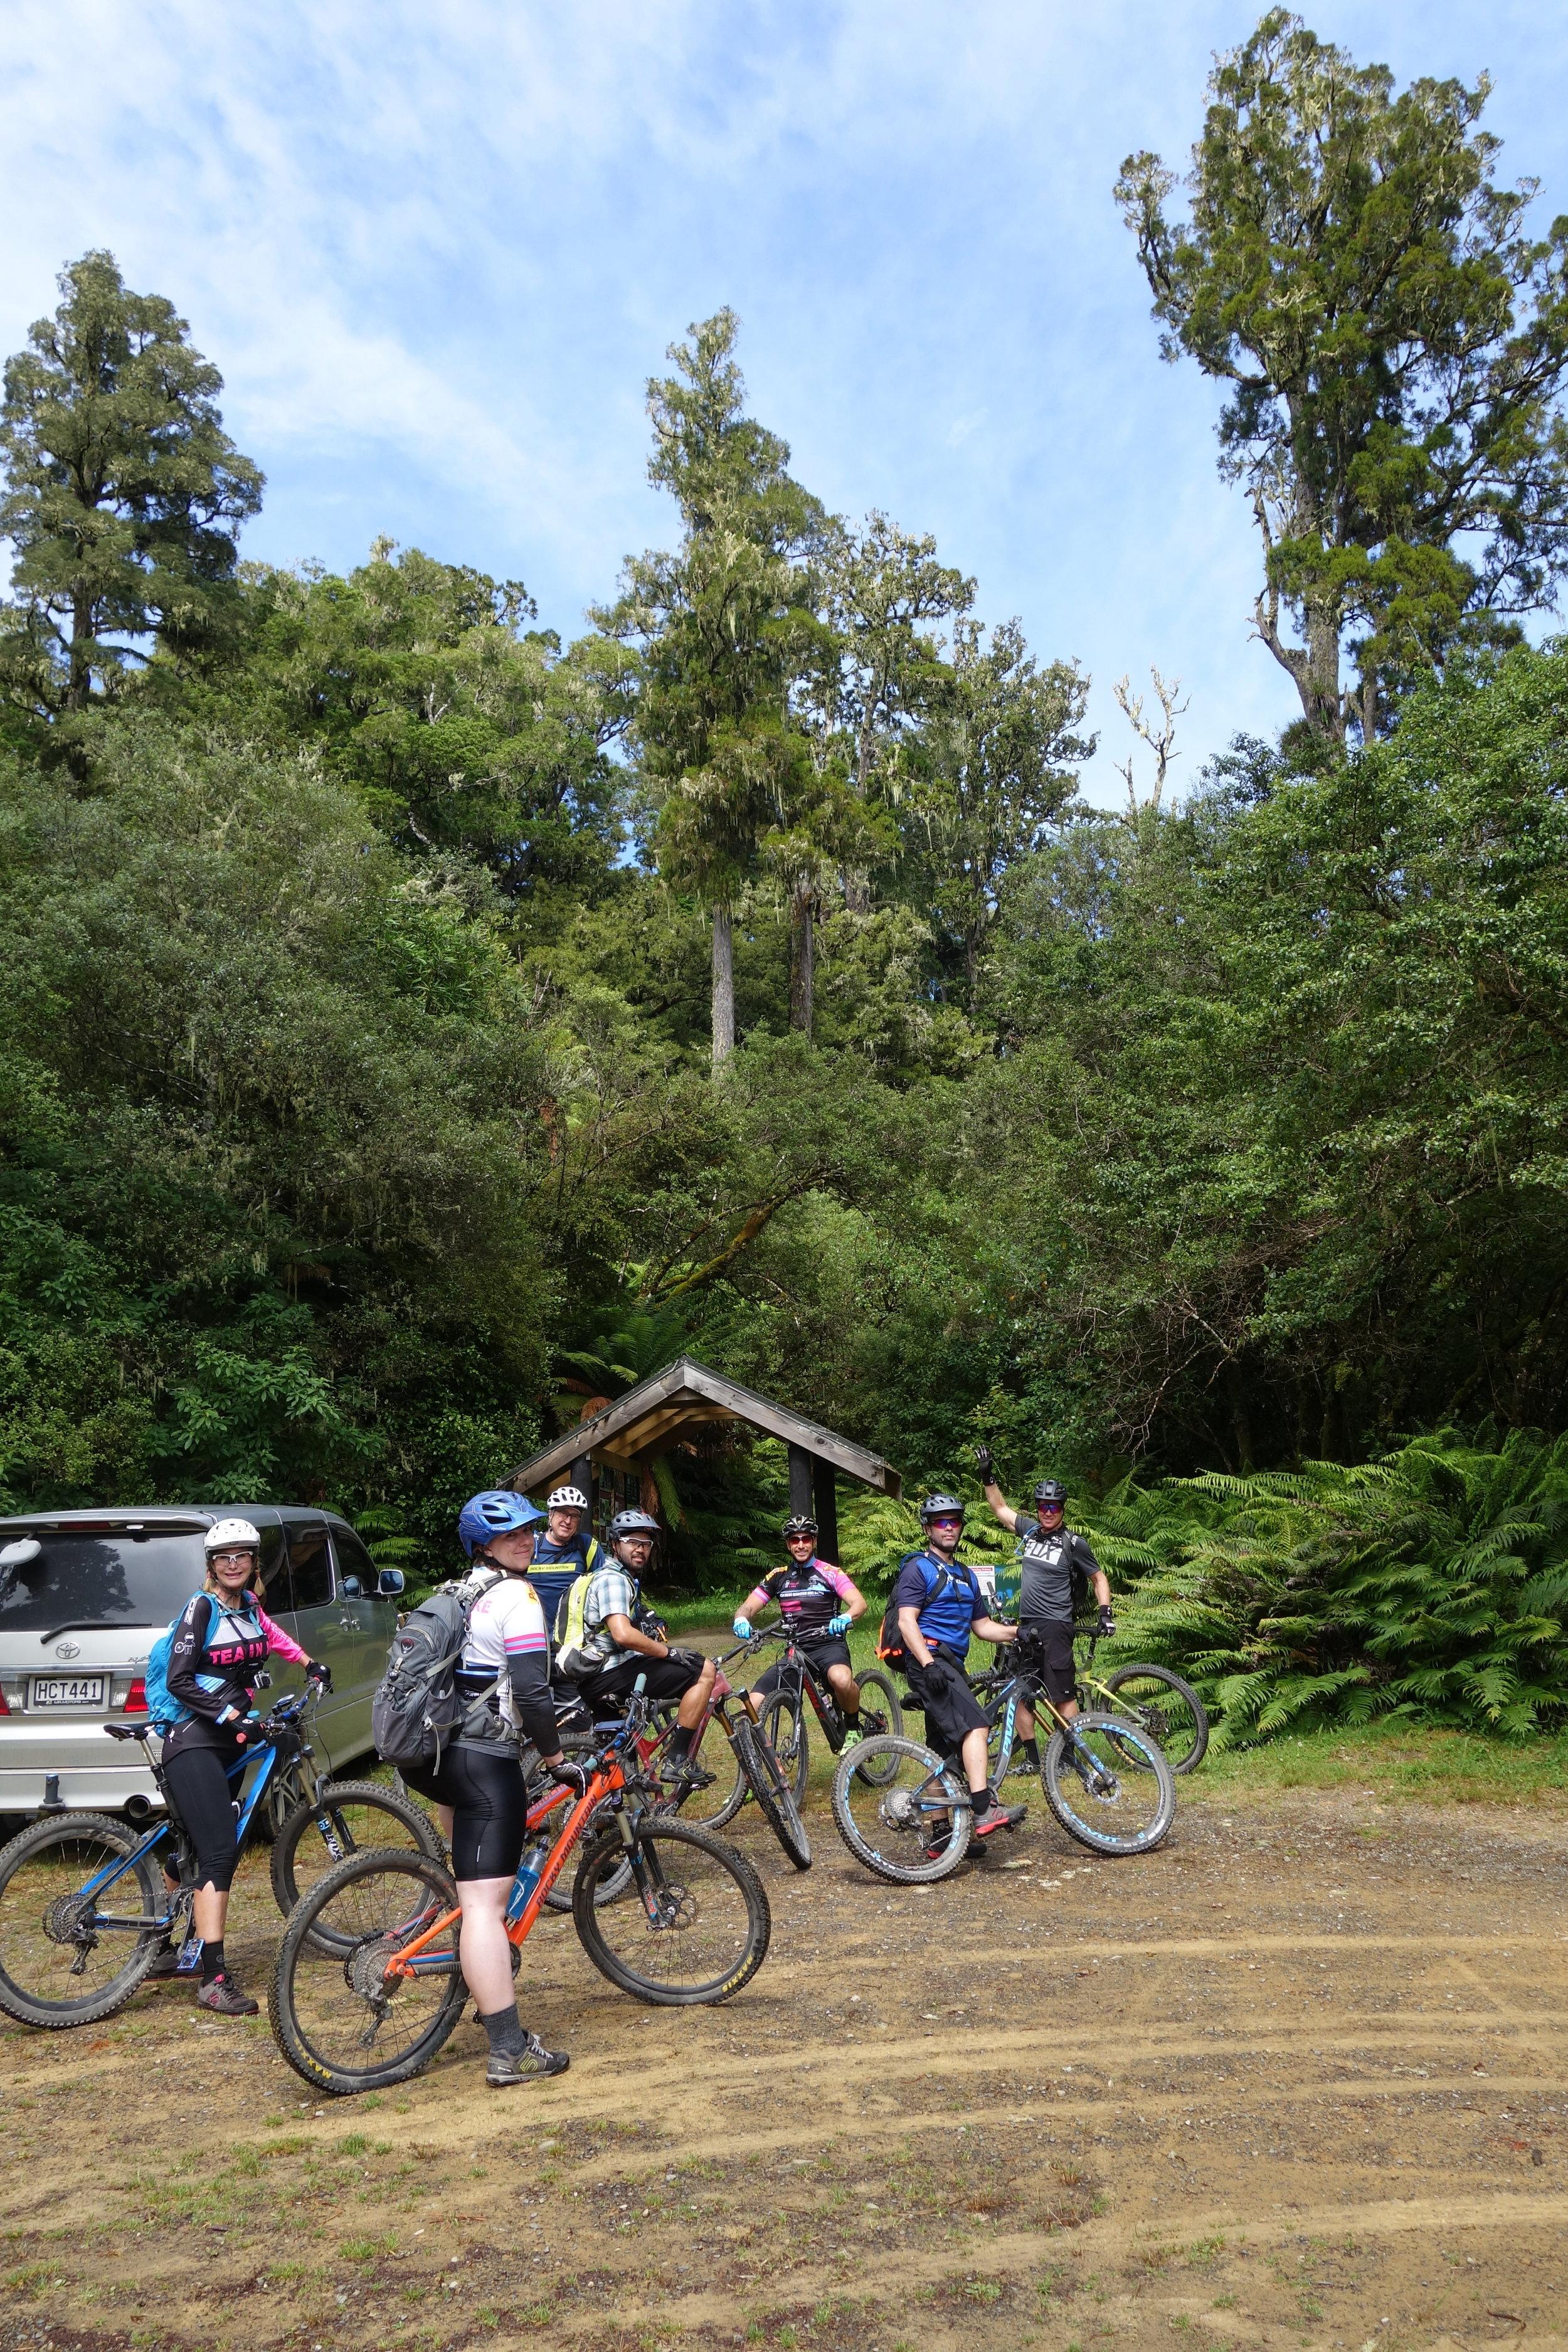 Team Ninja at the trail head